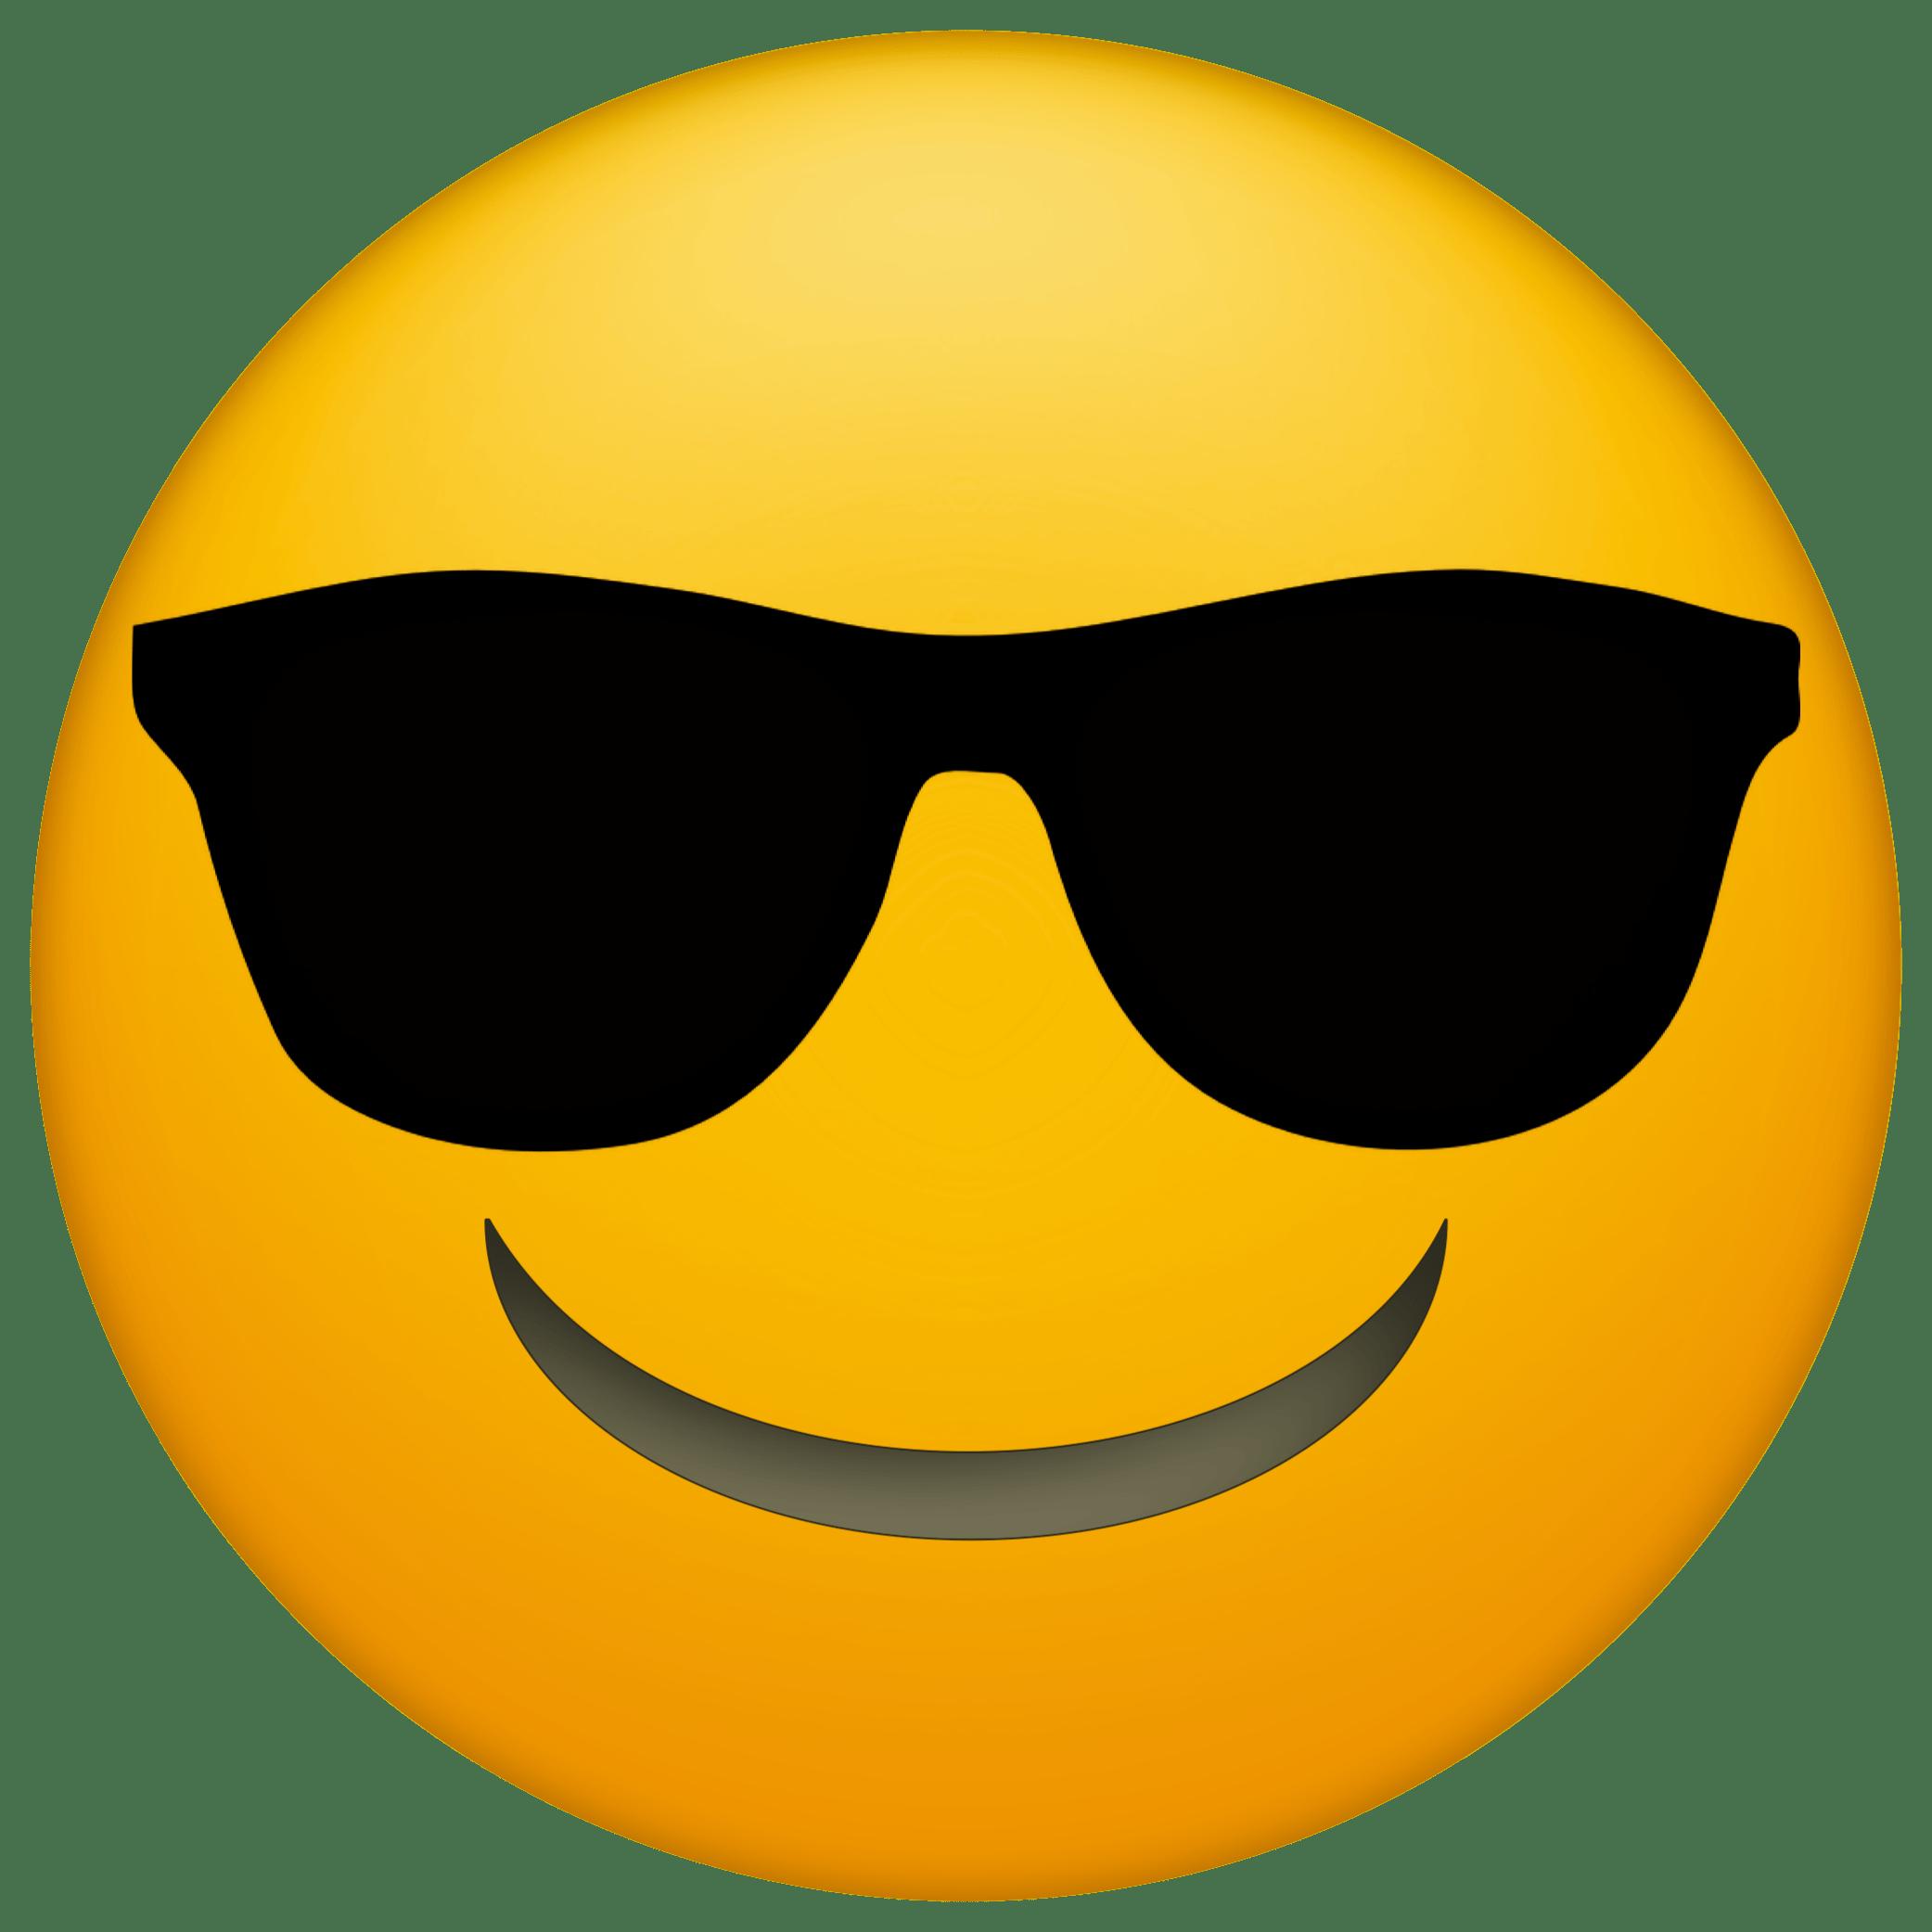 Heart eyes emoji clipart clipart black and white download Emoji Faces Printable {Free Emoji Printables} - Paper Trail Design clipart black and white download